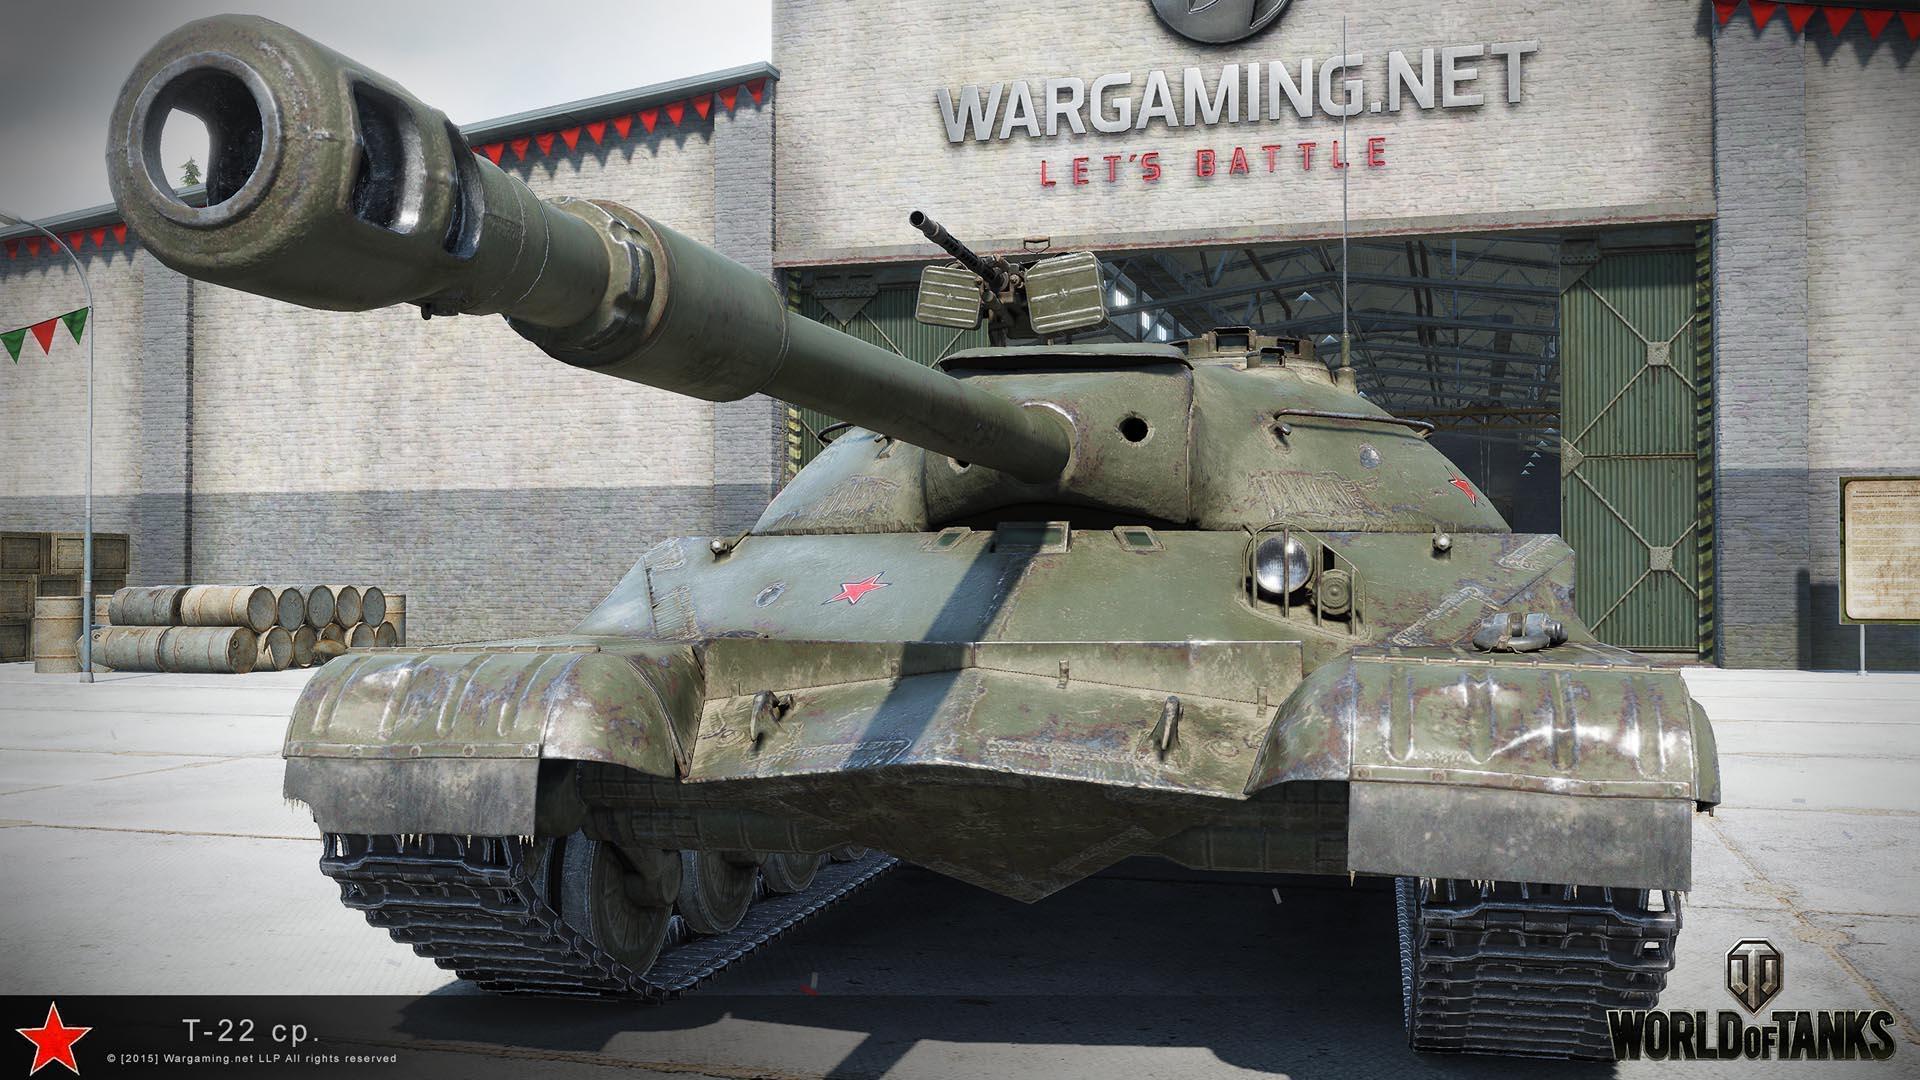 XVMCN 大战力系统开发及坦克世界战绩插件中文化团队 智囊团